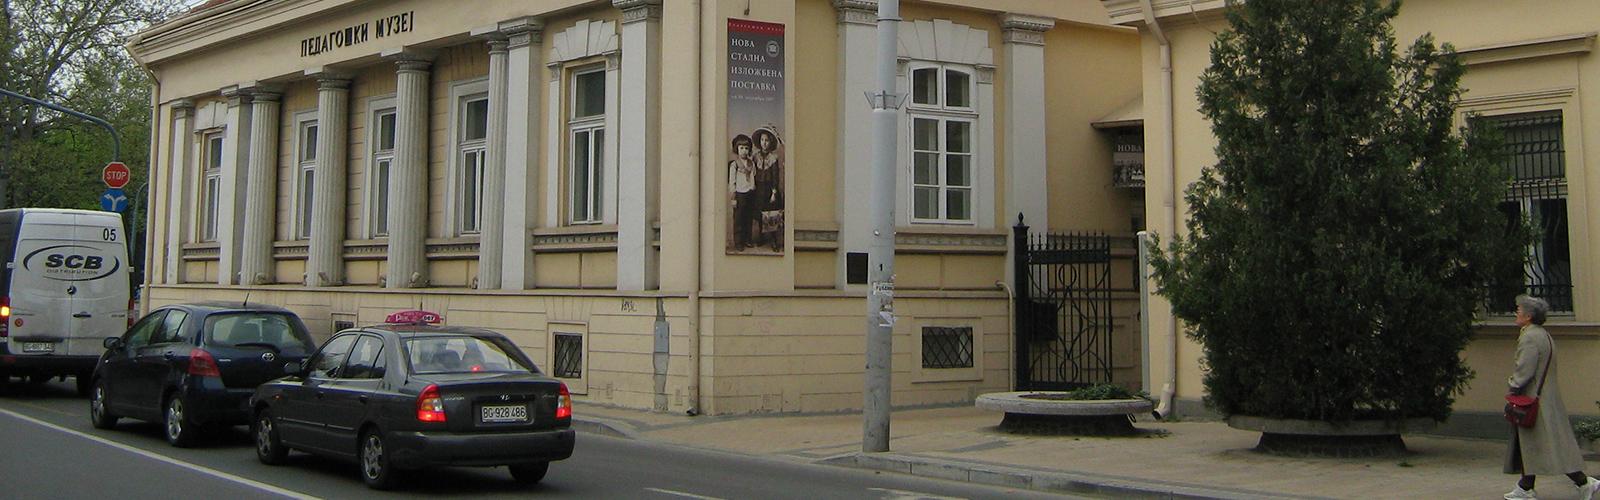 Concierge Belgrade   Pedagoški muzej